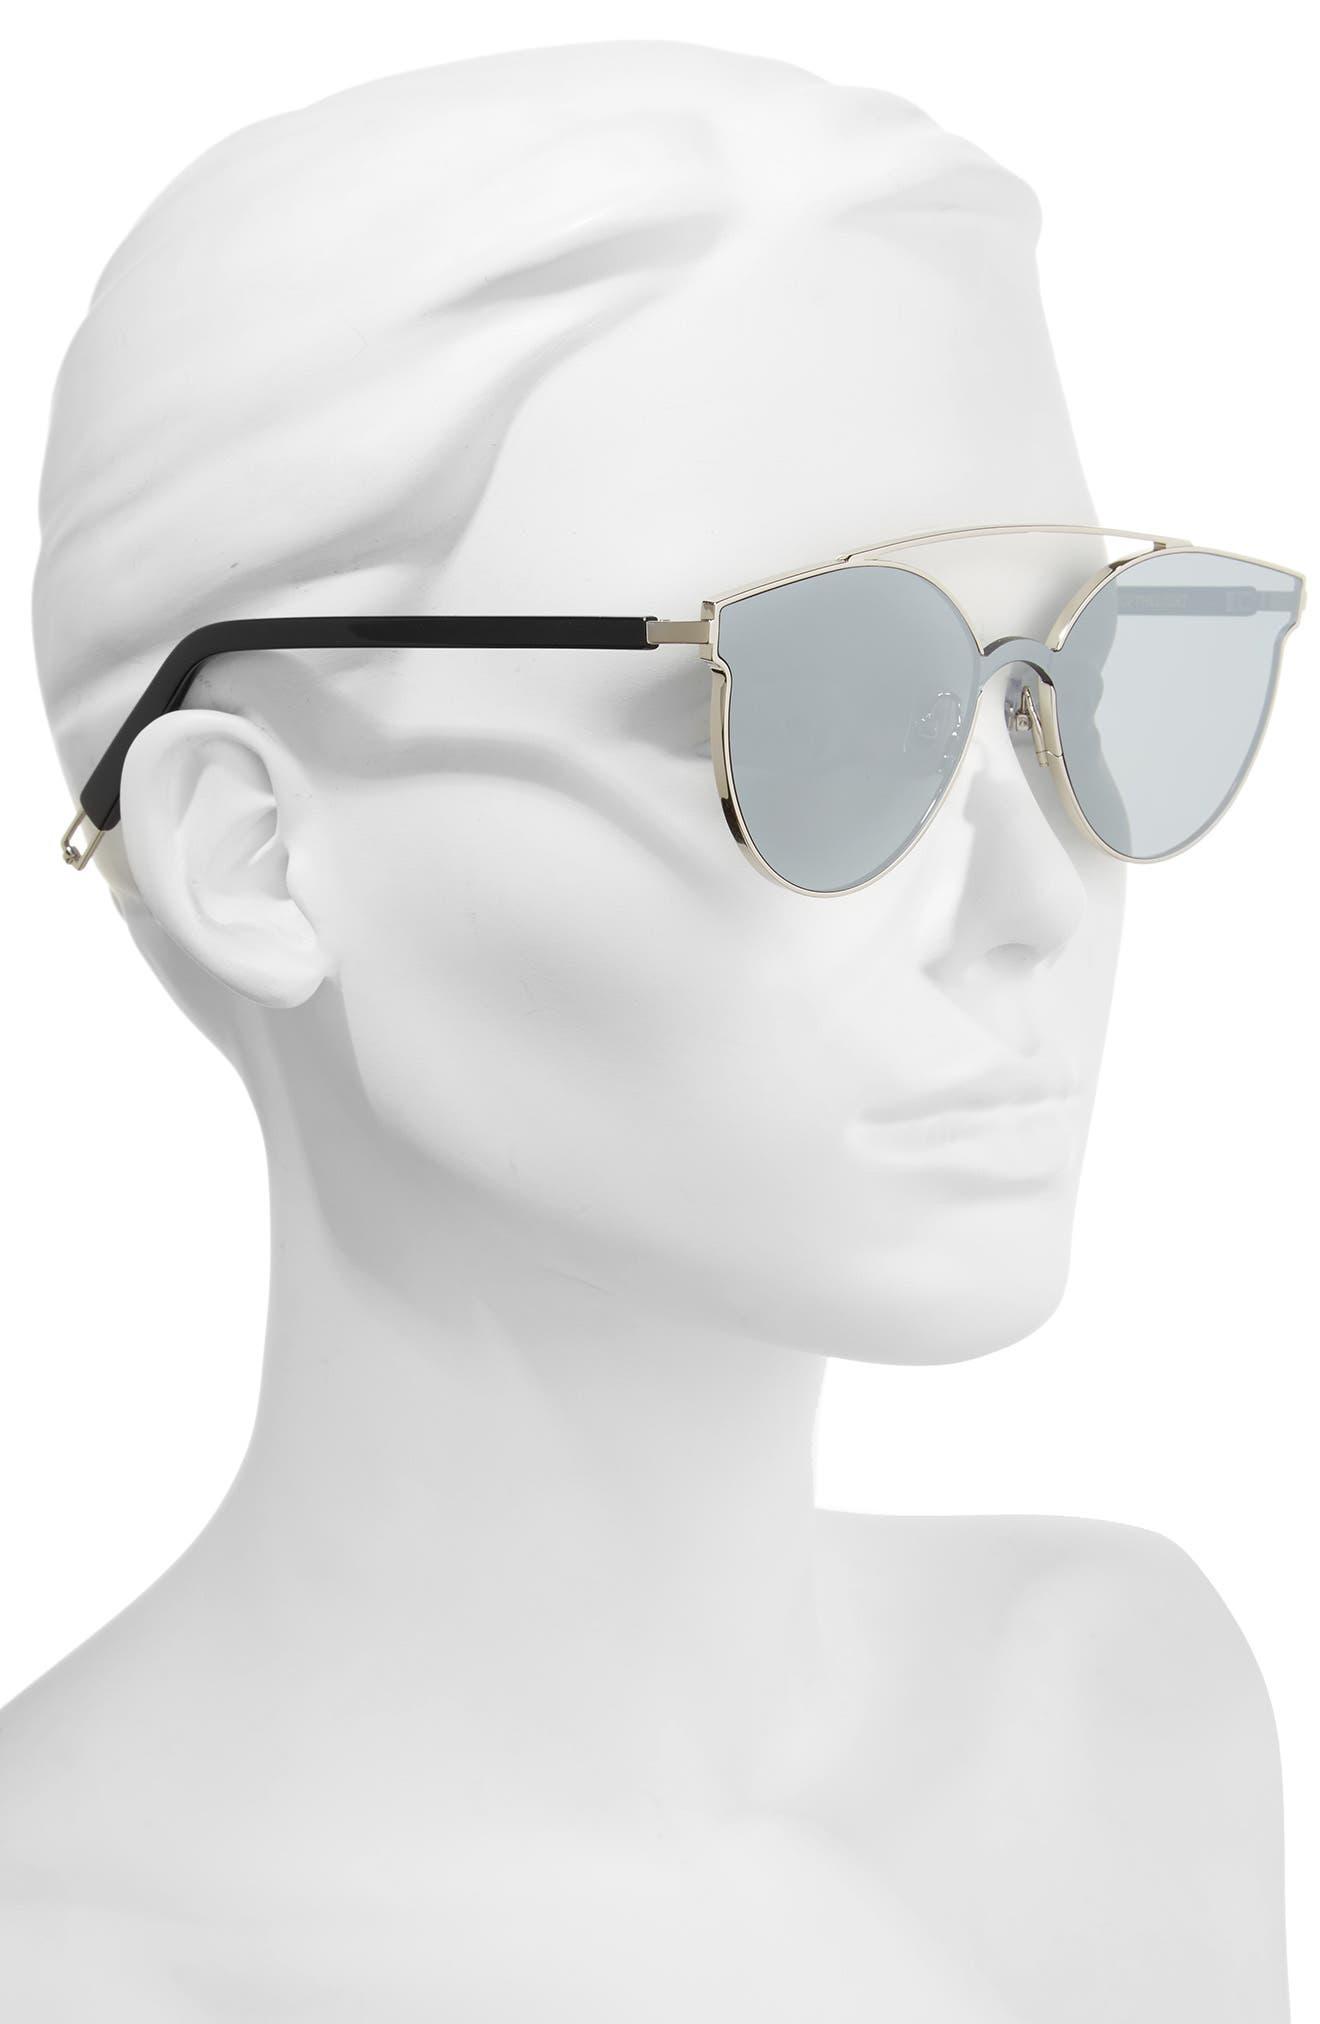 Tilda Swinton x Gentle Monster Trick of the Light 60mm Shield Sunglasses,                             Alternate thumbnail 2, color,                             040